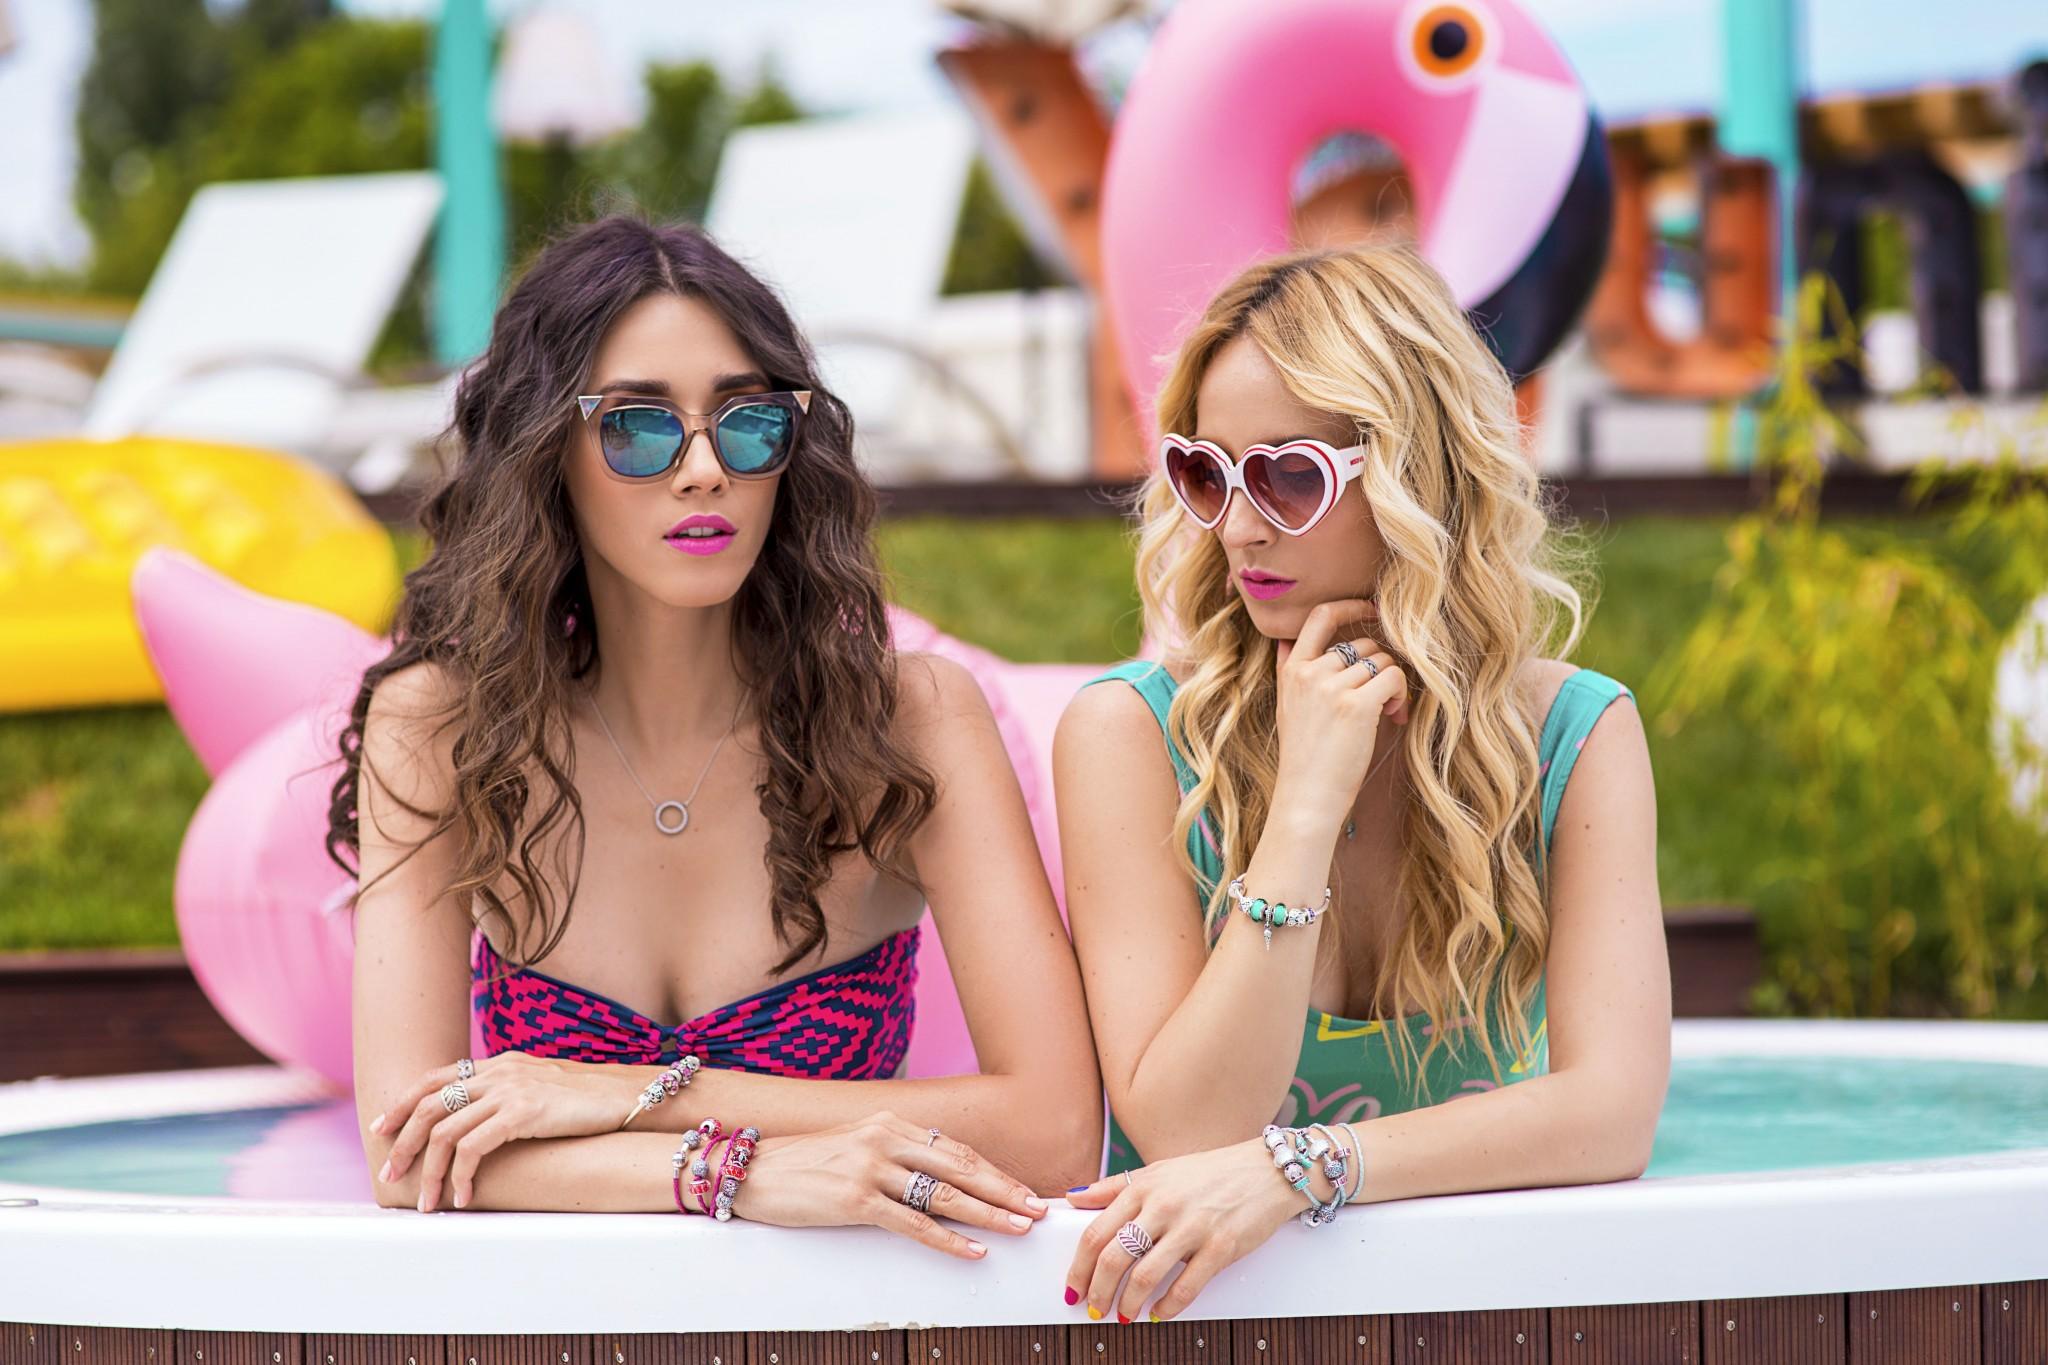 8fabulous_muses_pandora_summer2016_collection_youniverse_piscina